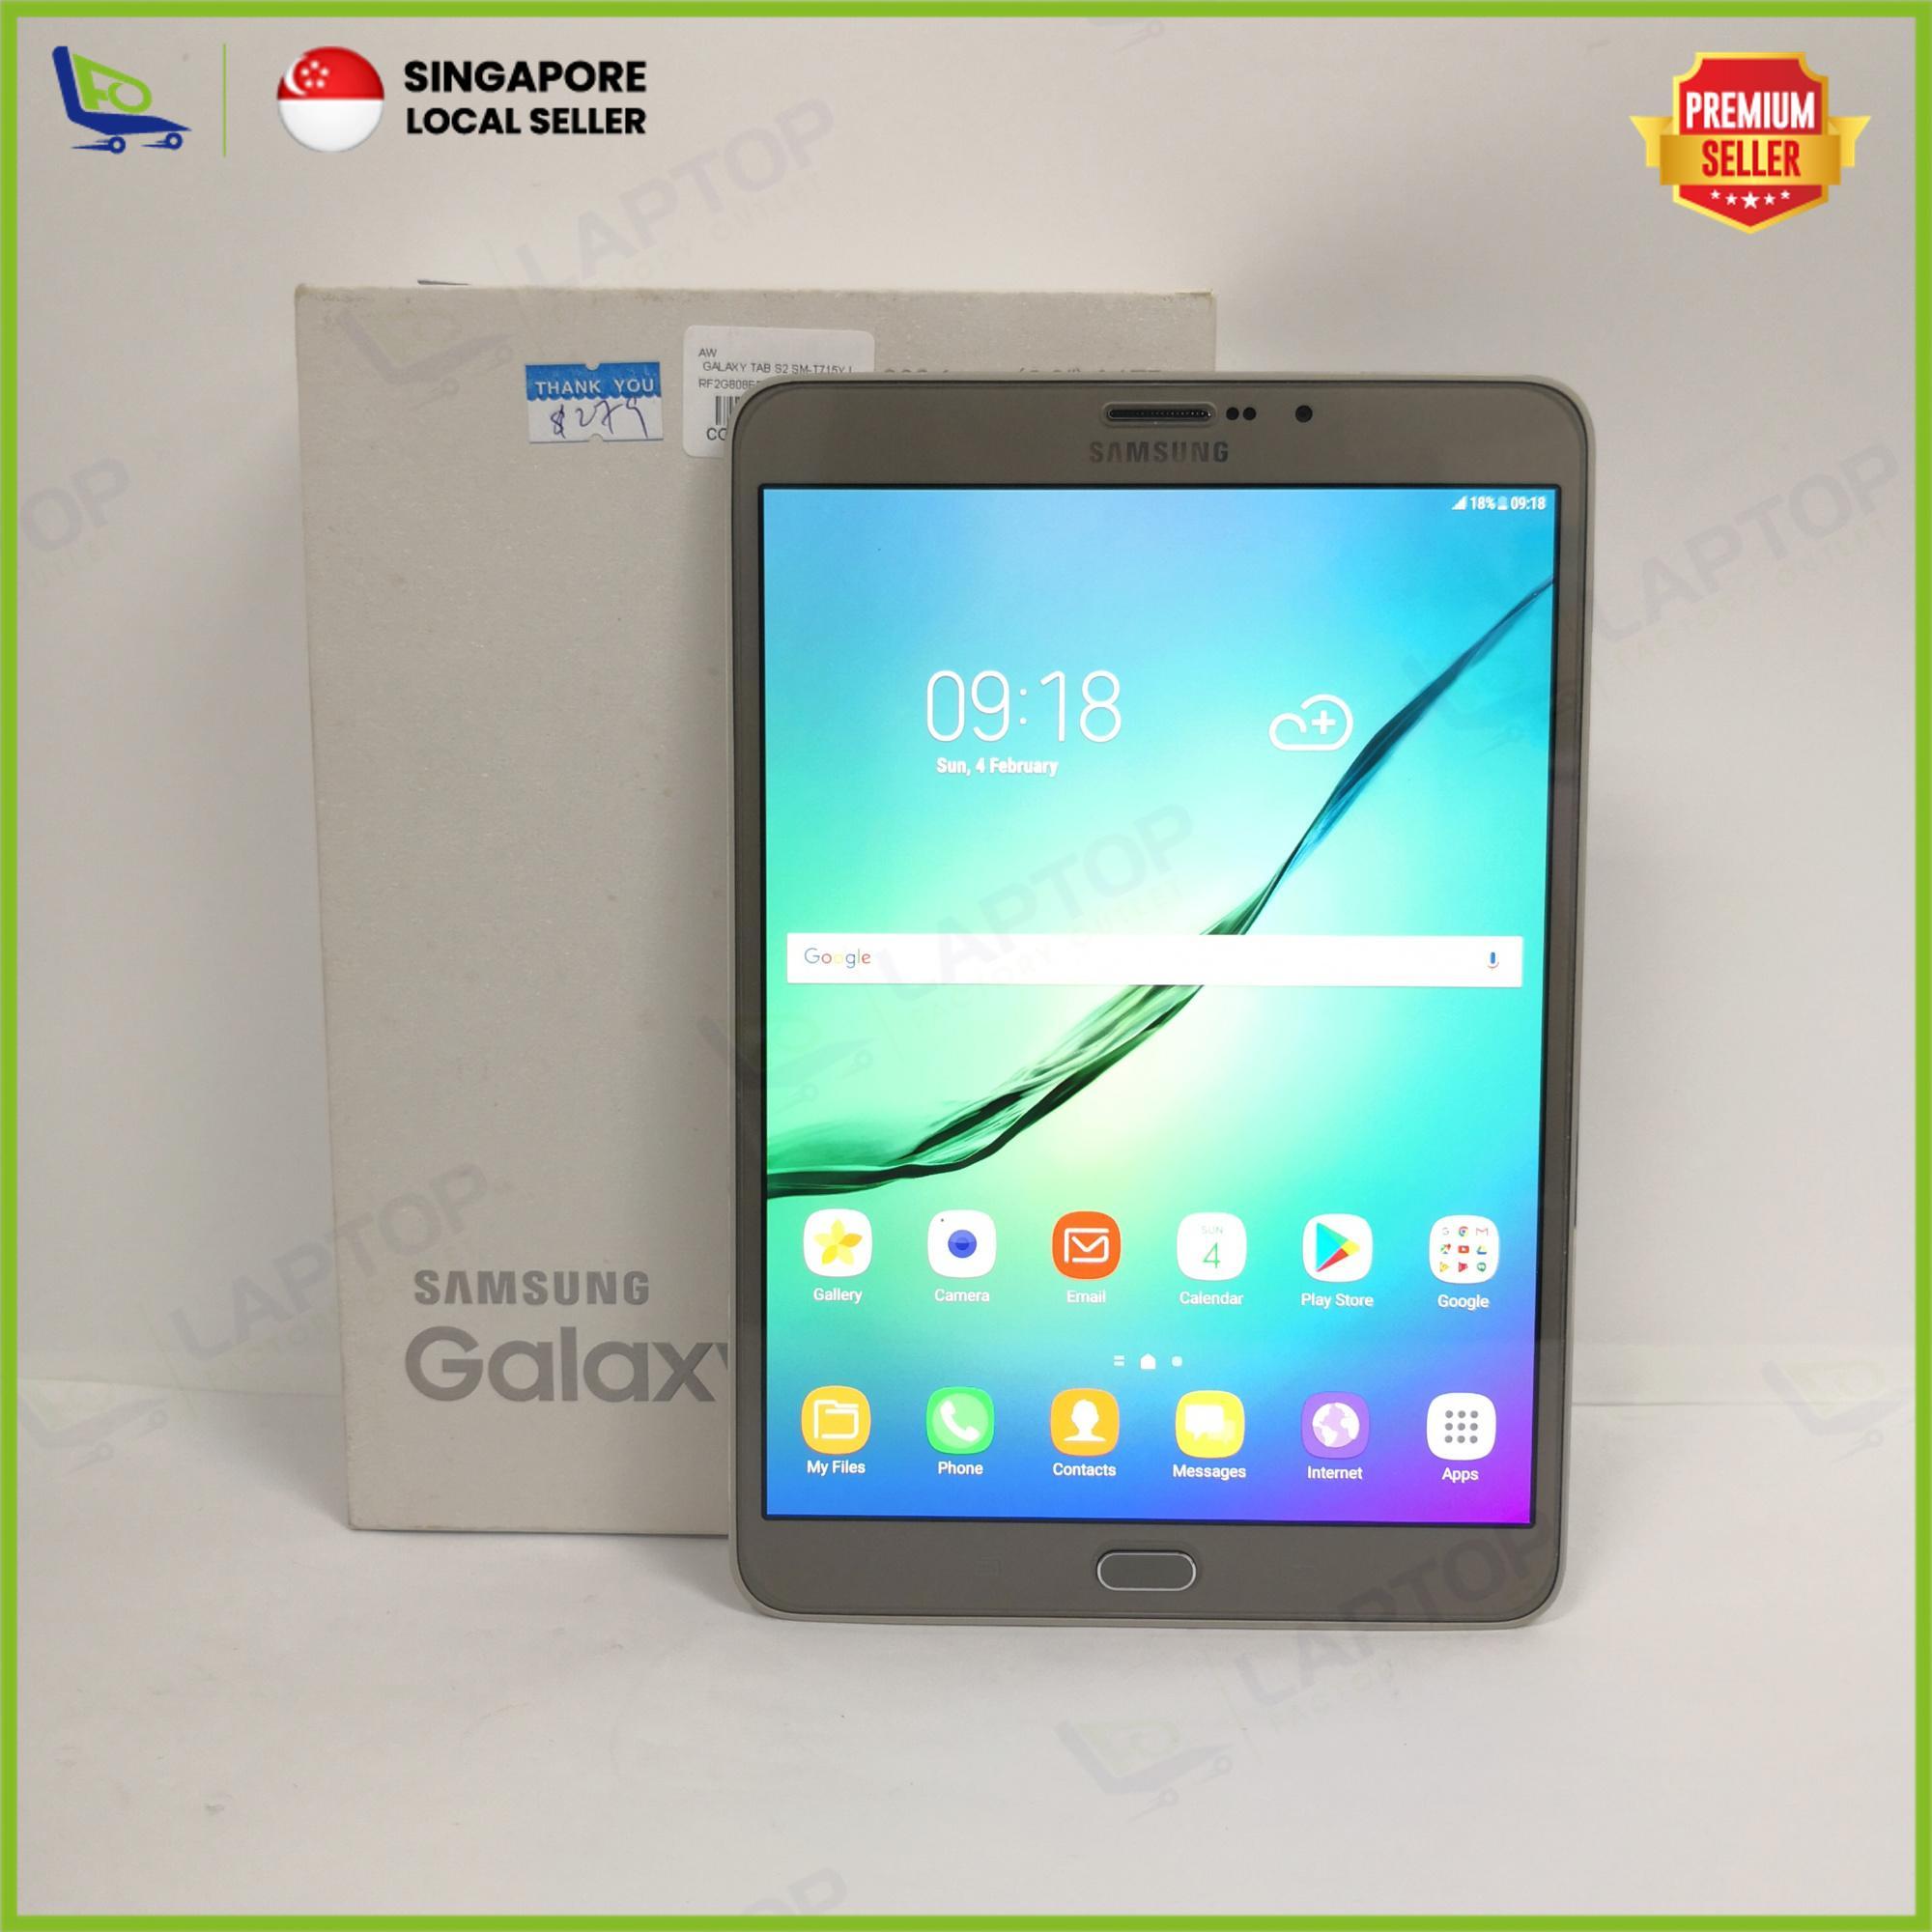 SAMSUNG Galaxy Tab S2 8 0 T715Y (LTE) 32GB Gold [Preowned] Refurbished